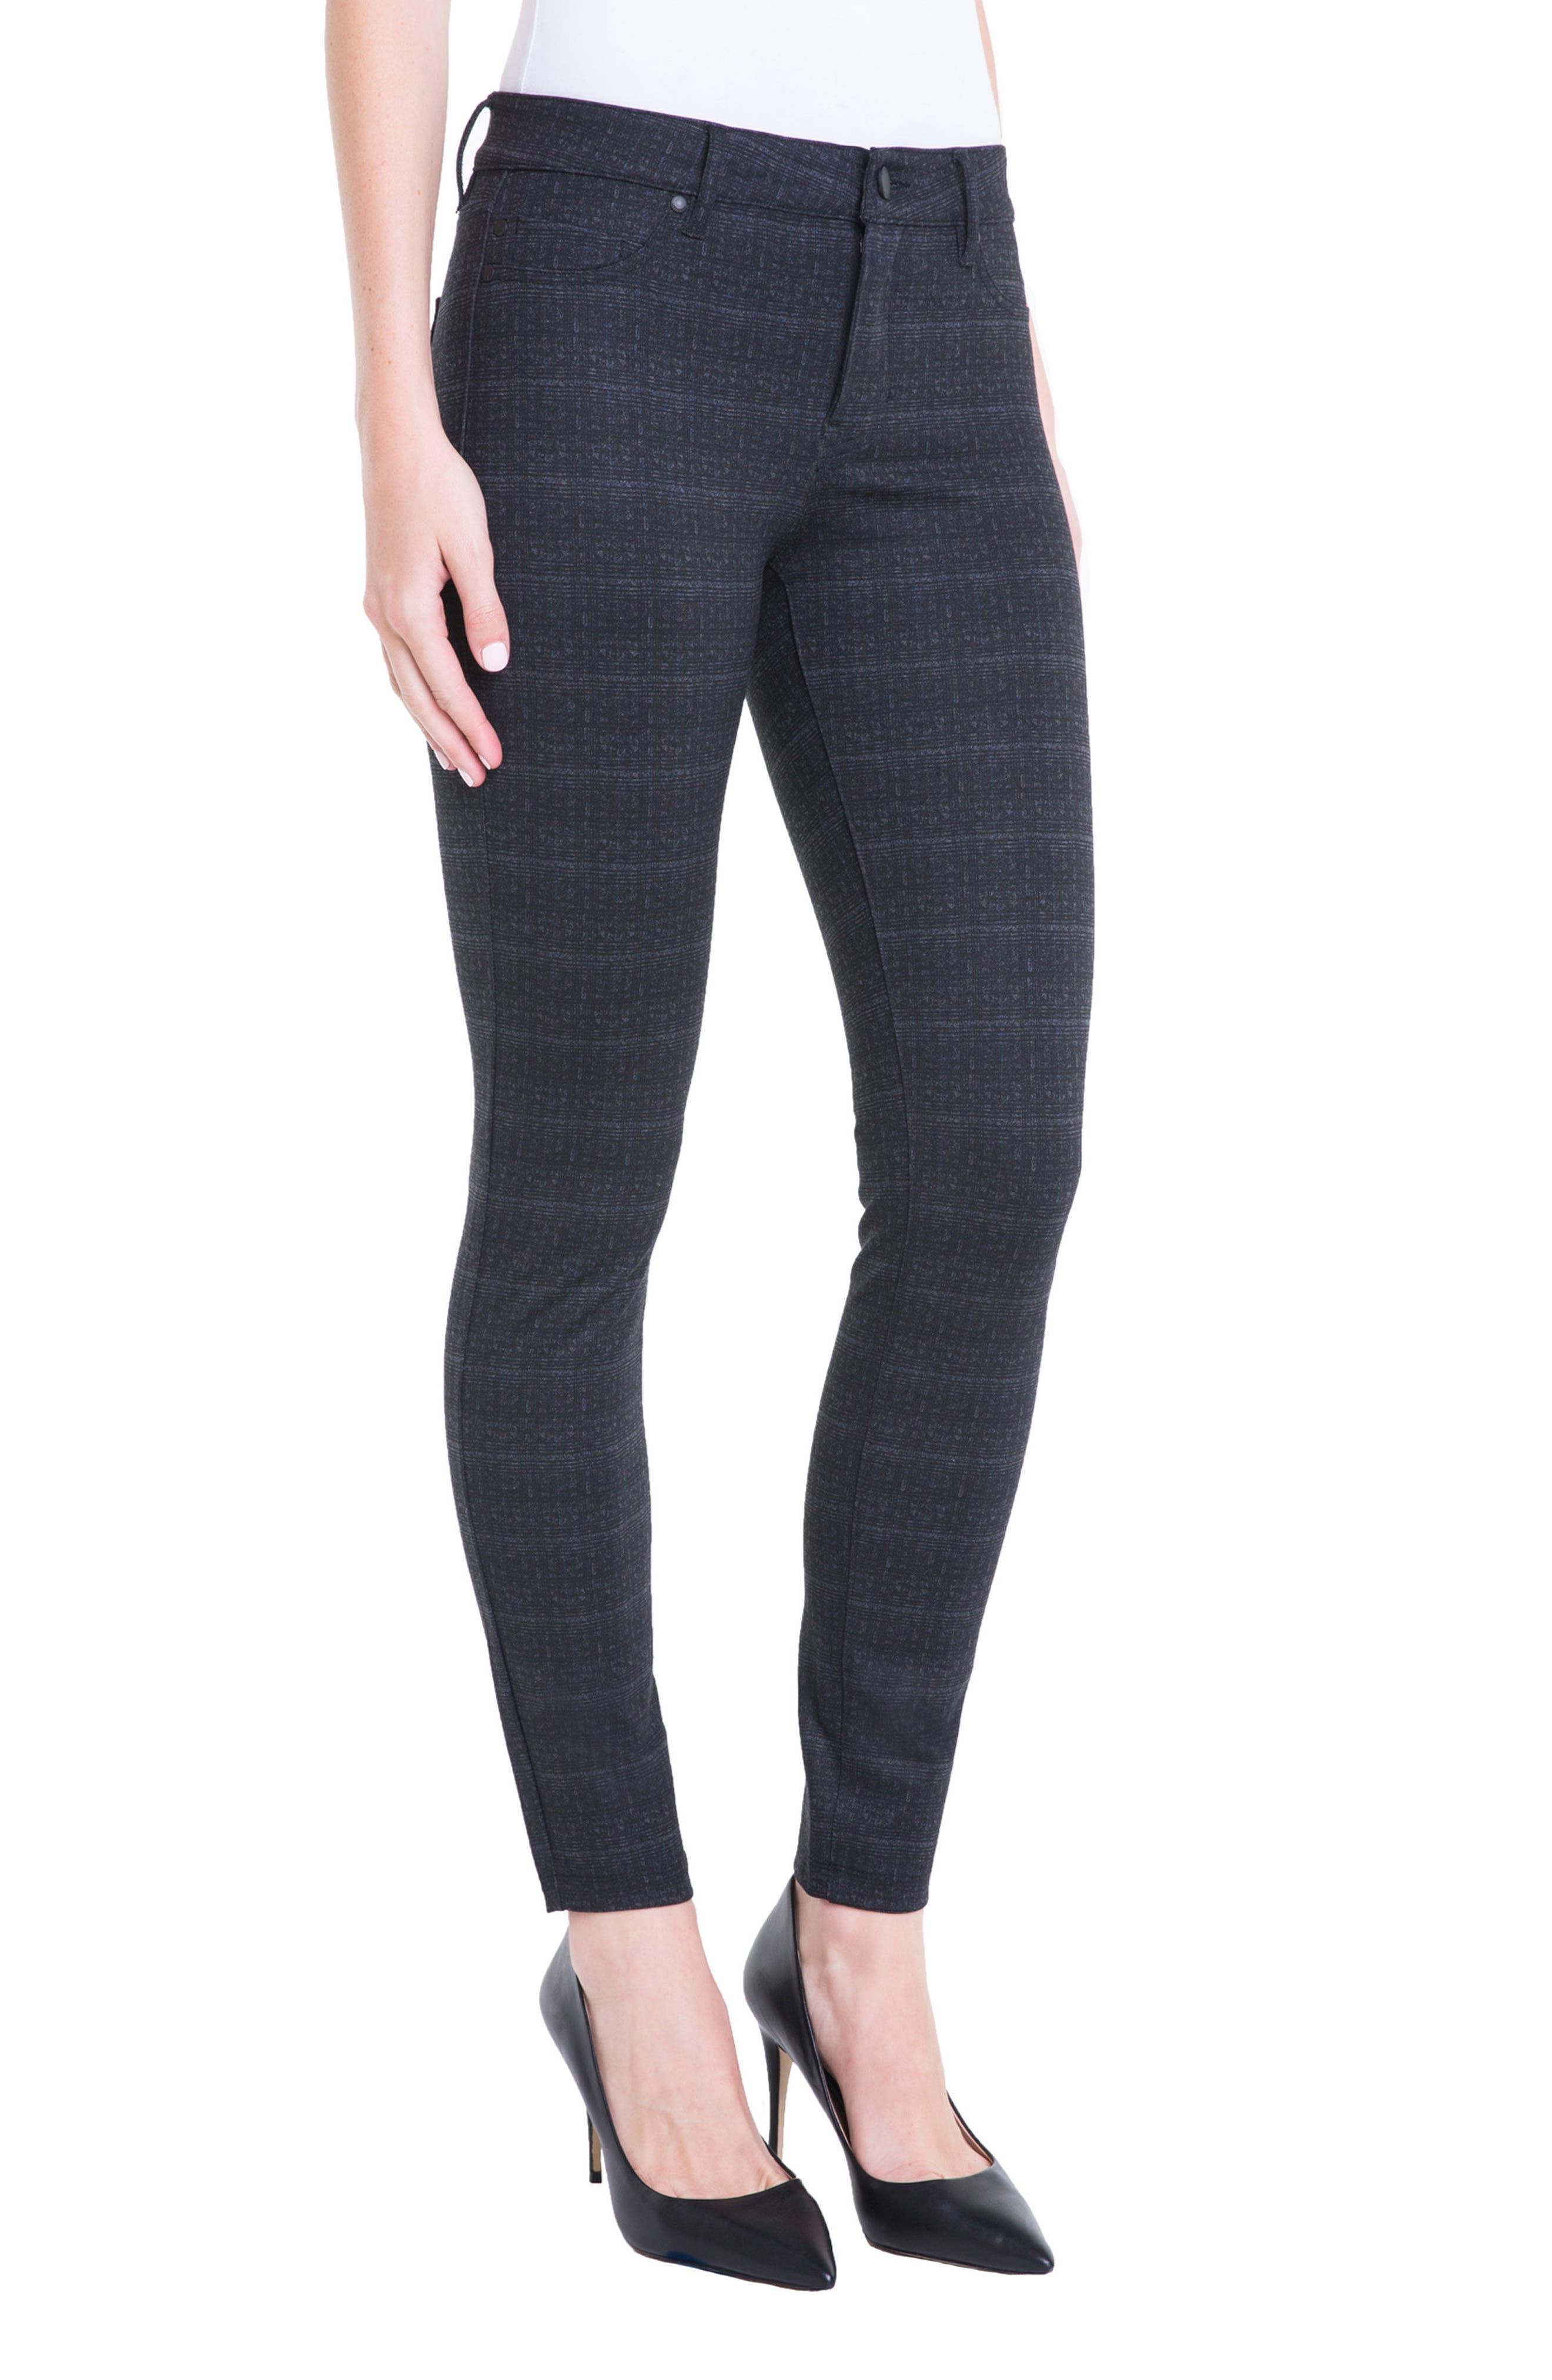 Plaid Super Skinny Ponte Knit Pants,                             Alternate thumbnail 3, color,                             022